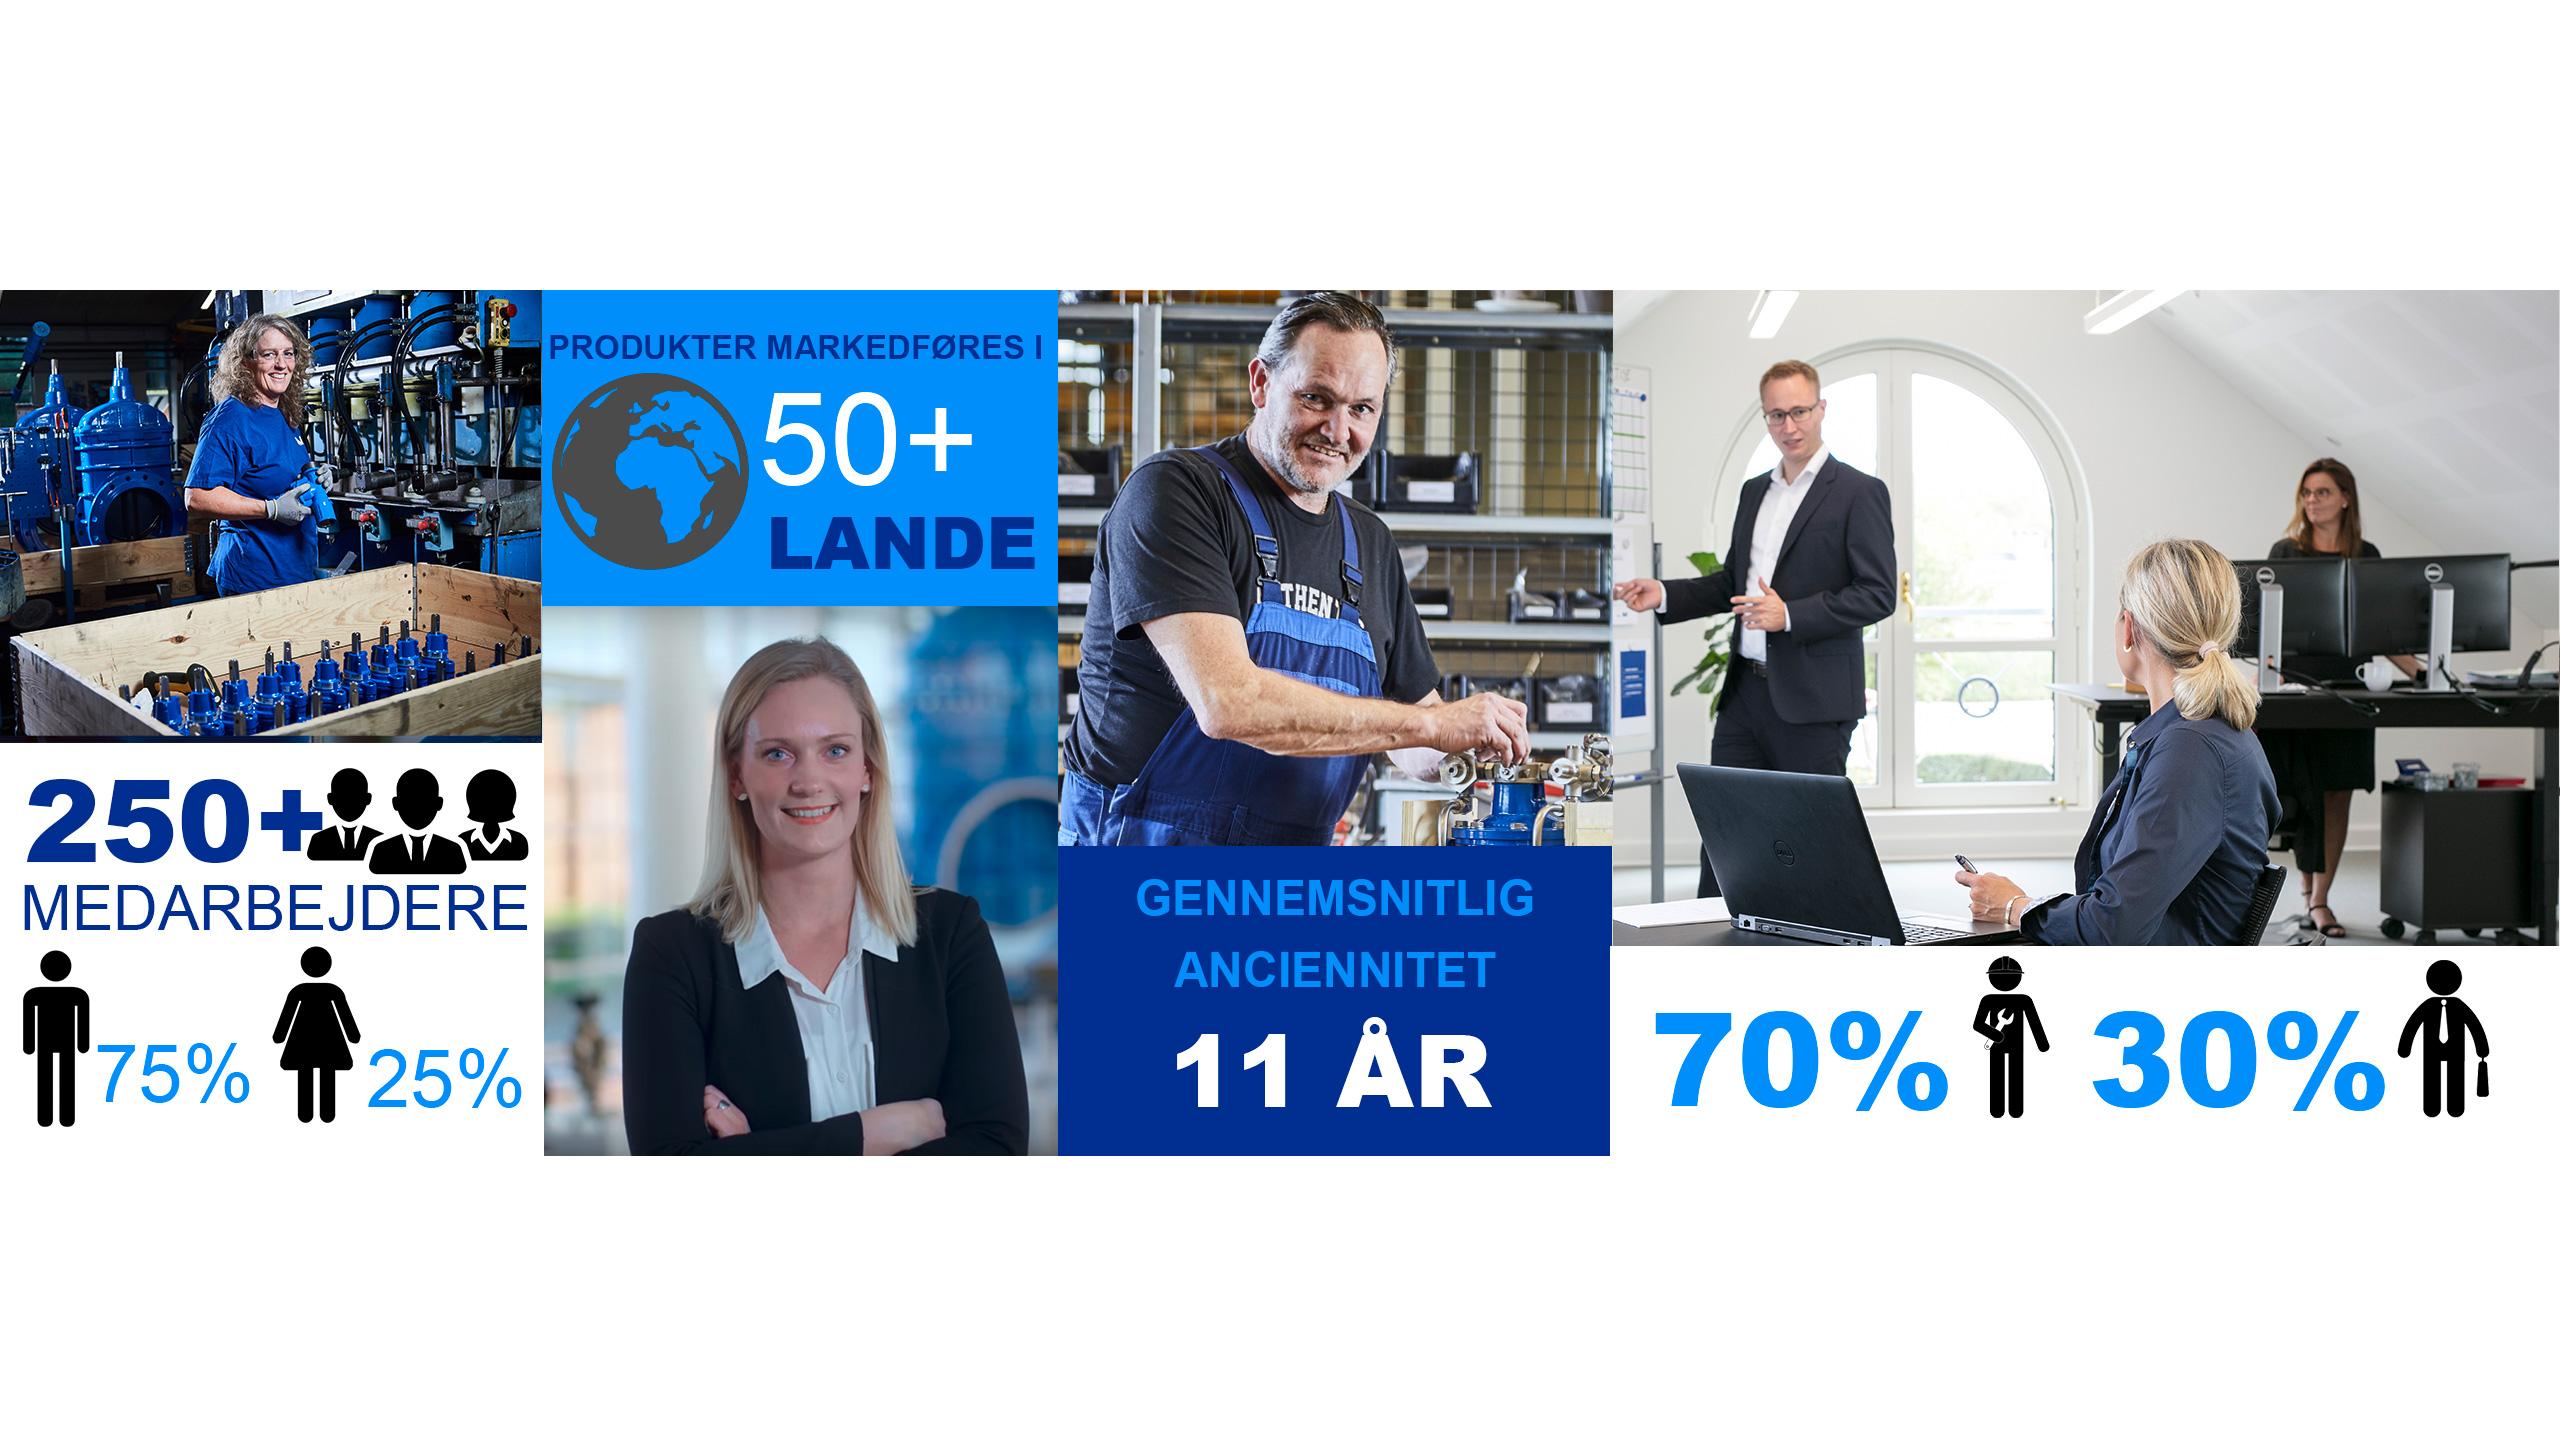 Hvordan er AVK International som arbejdsplads